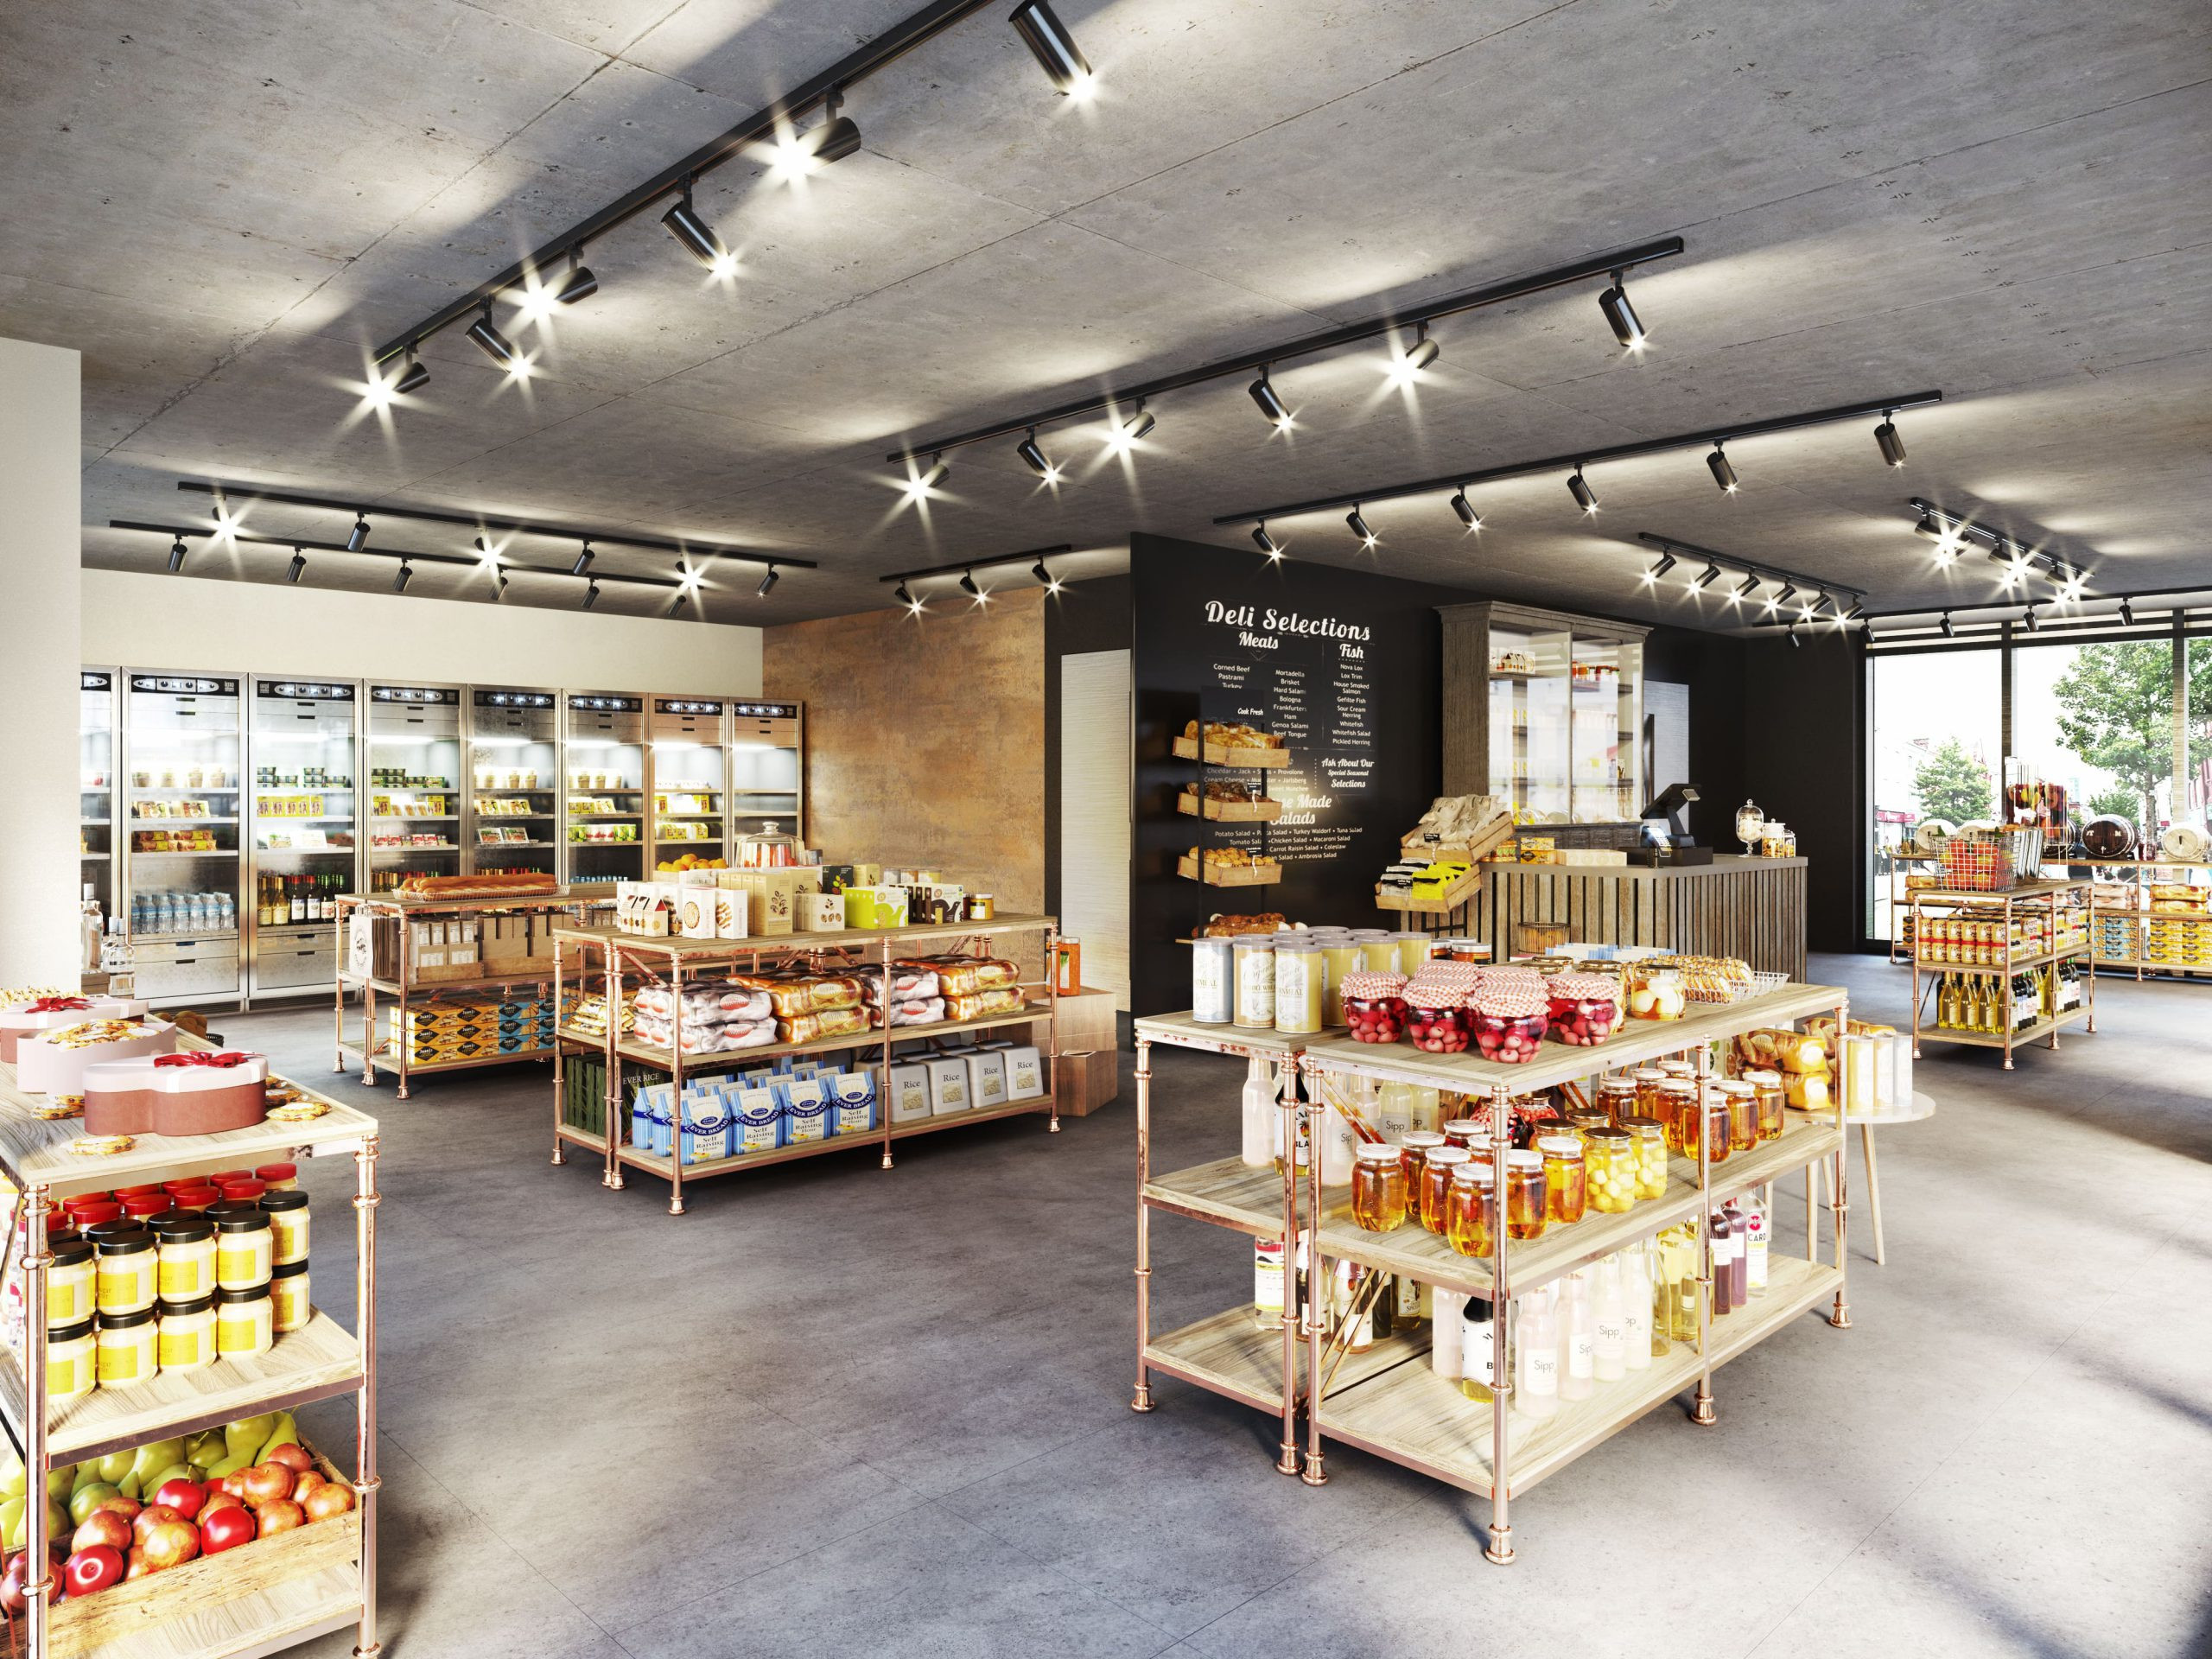 Heaton Group_Bishopgate_Preston_Retail_Space_Interior_Visualisation_CGI_DELI